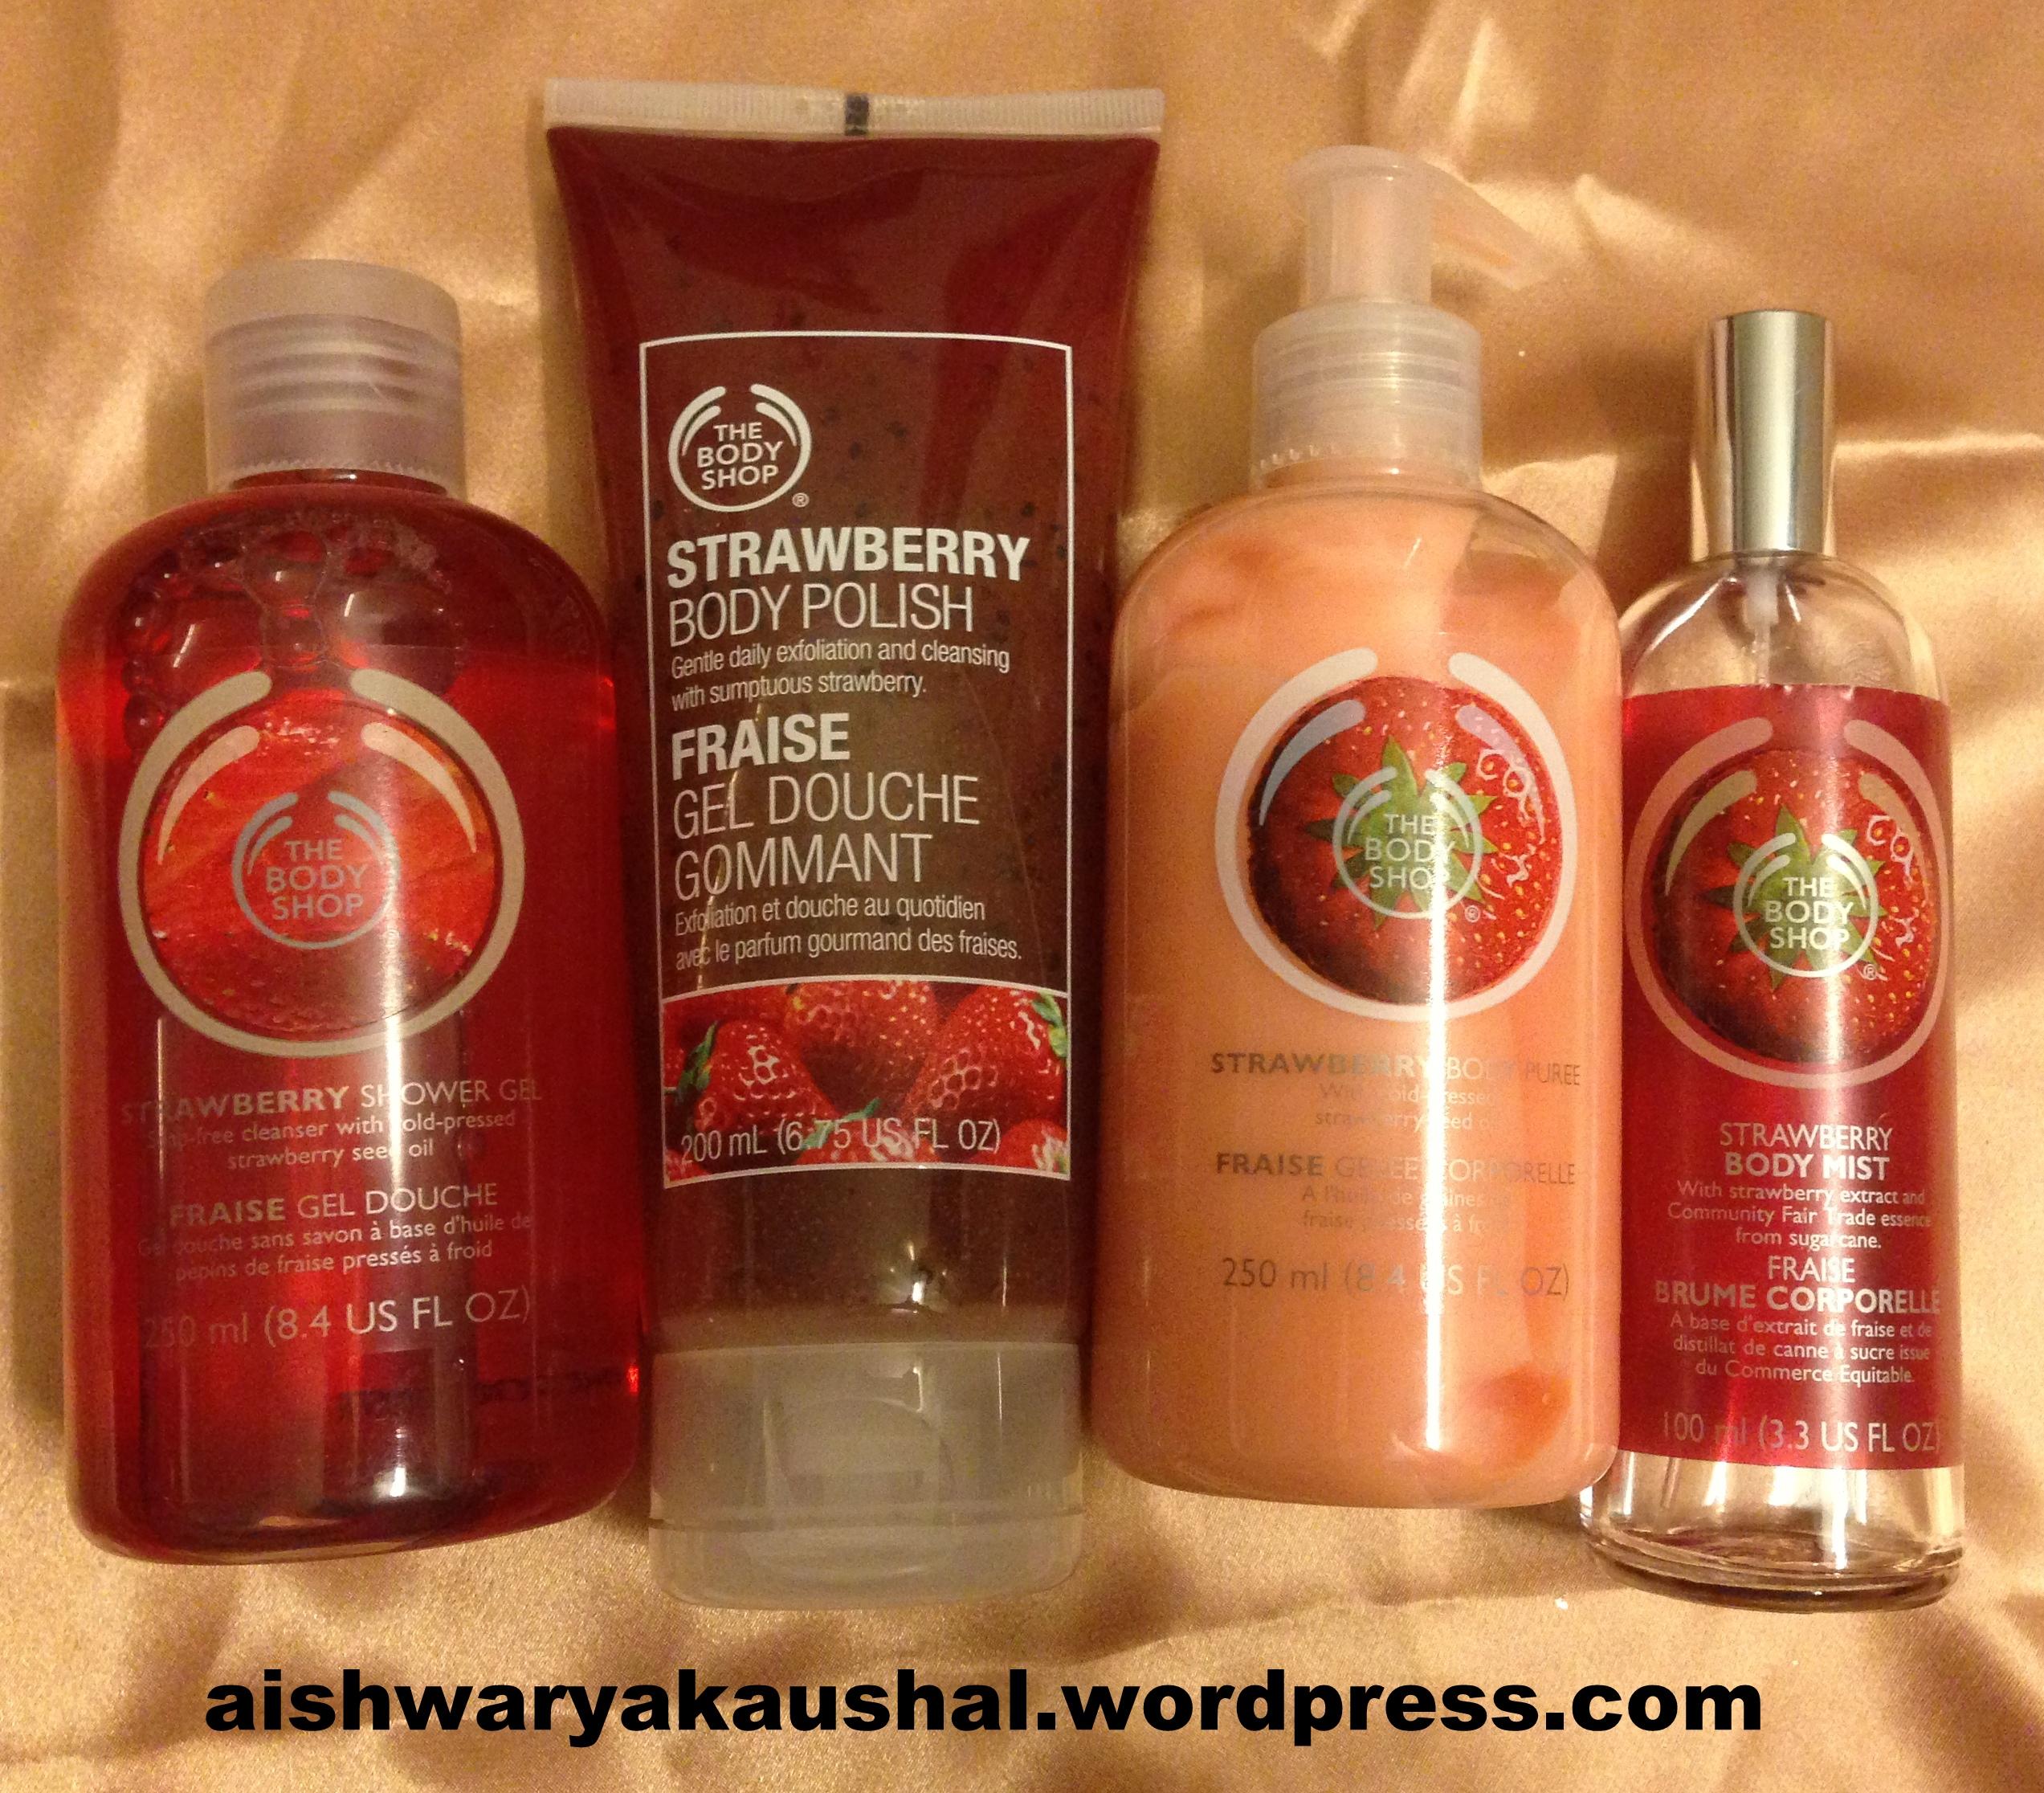 the body shop strawberry range